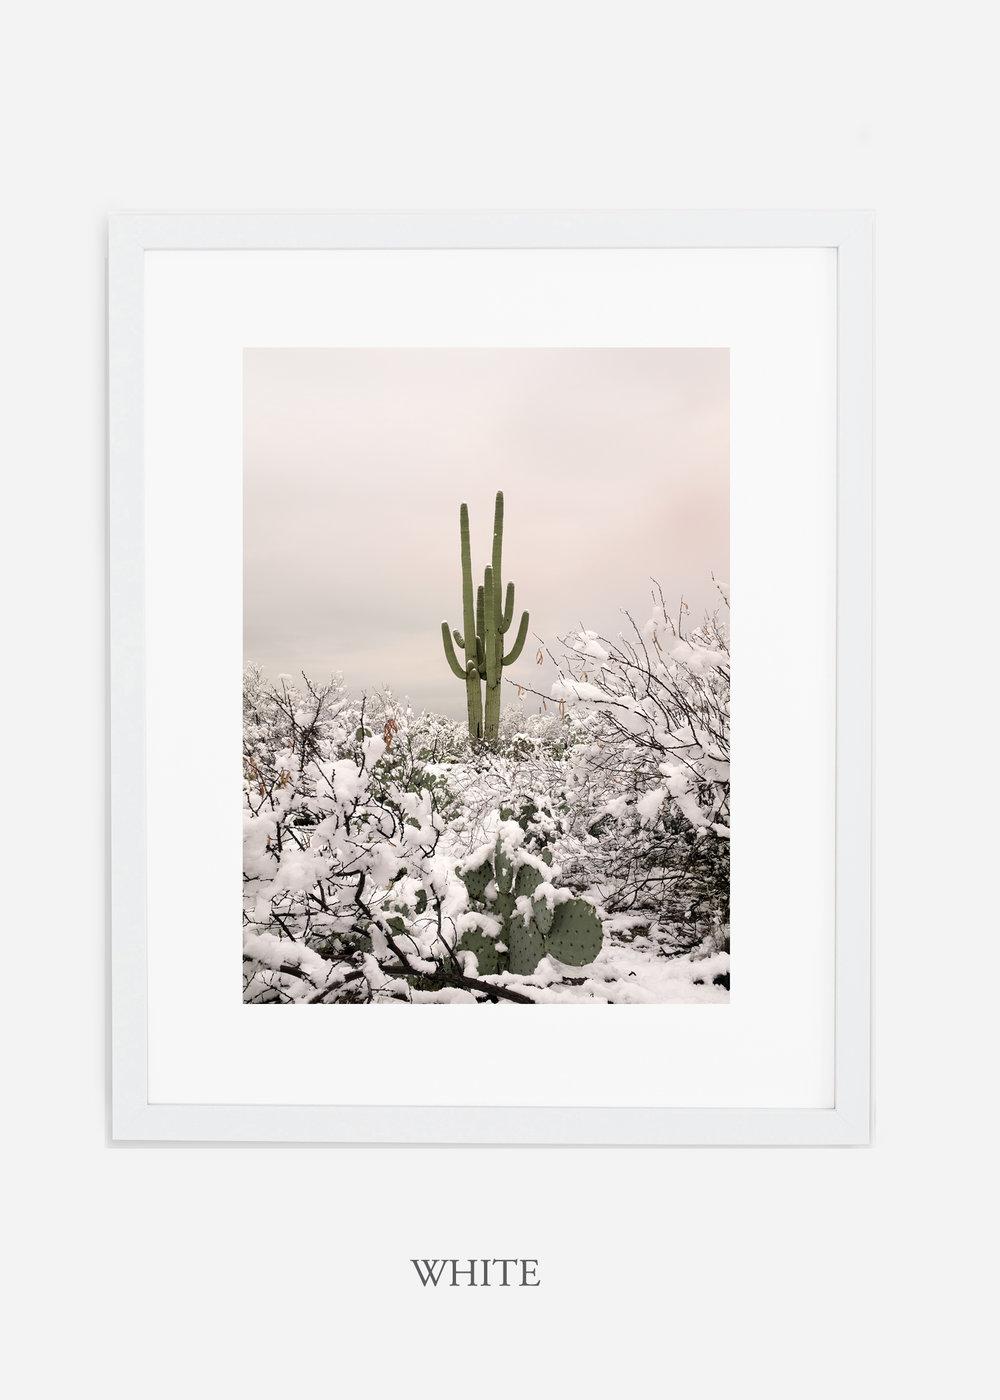 whiteframe-saguaroNo.2-wildercalifornia-art-wallart-cactusprint-homedecor-prints-arizona-botanical-artwork-interiordesign.jpg